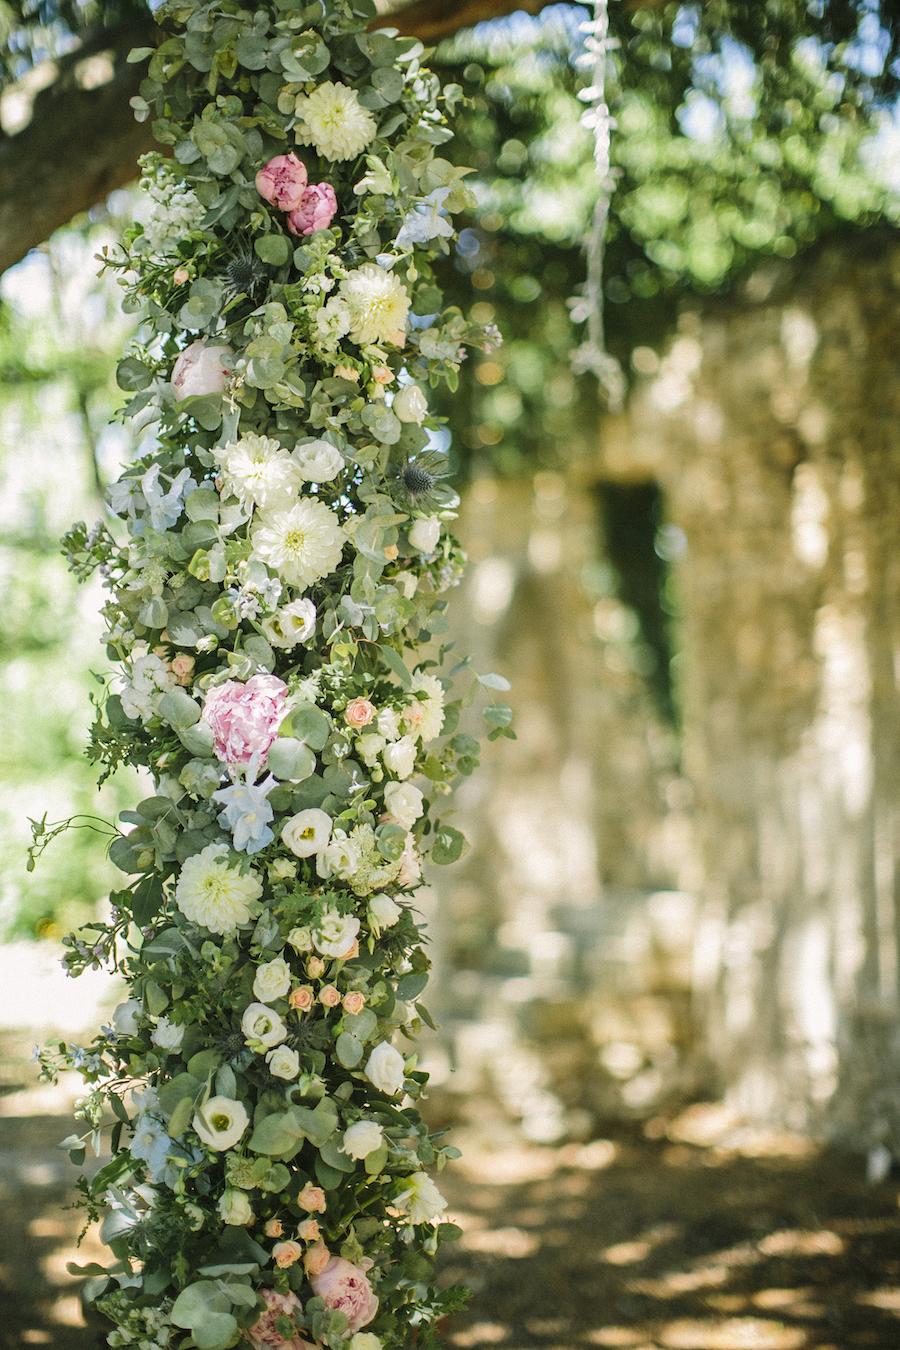 saya-photography-jewish-wedding-provence-rustic-lourmarin-le-galinier-28.jpg